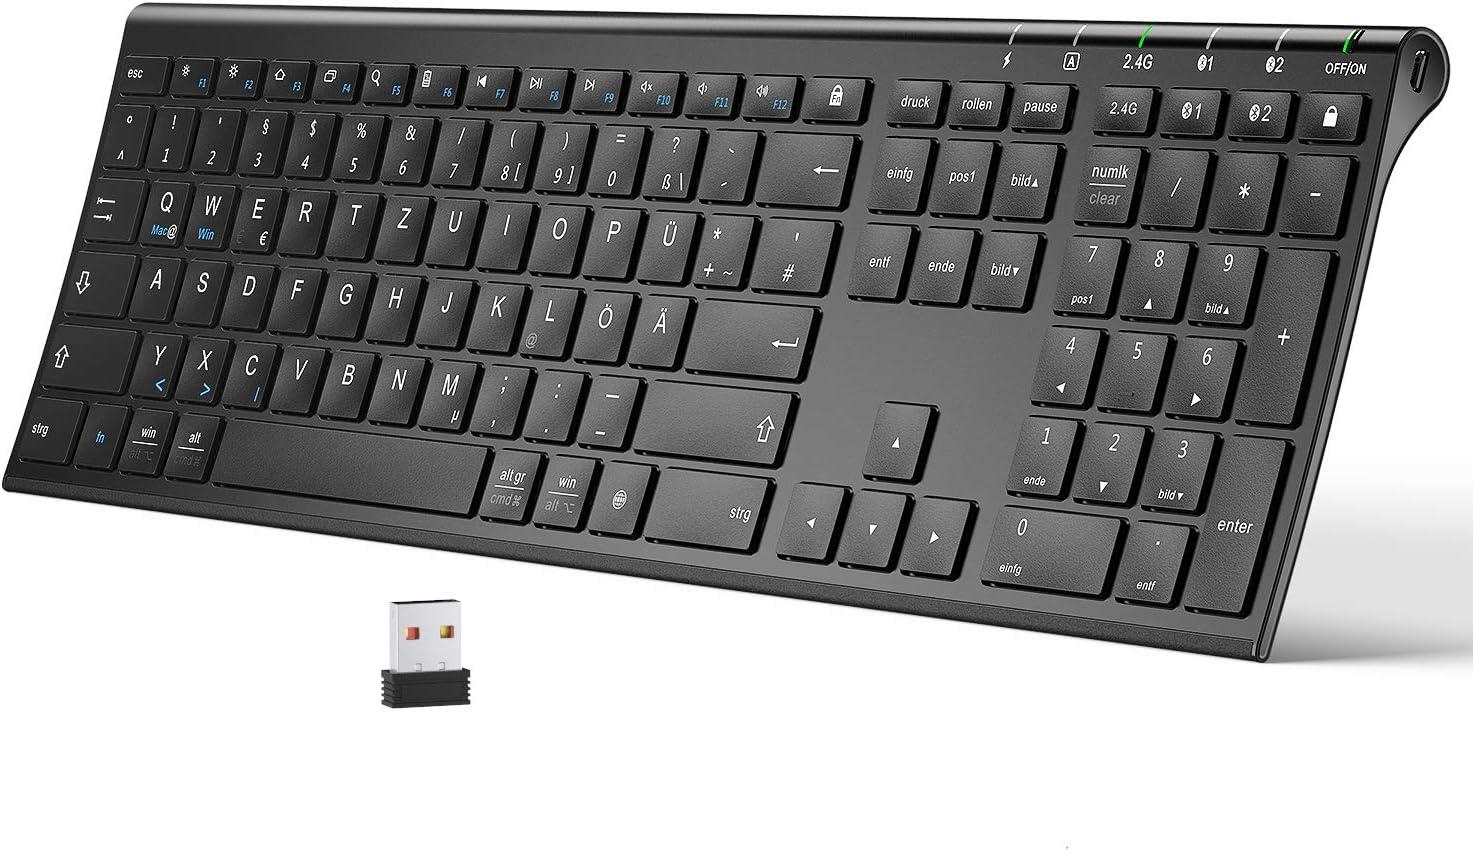 Teclado Bluetooth, doble Bluetooth + teclado inalámbrico 2.4G Multi Dispositivos QWERTZ Ultra Slim recargable para Mac, iPhone, Windows, Android, iOS, ...